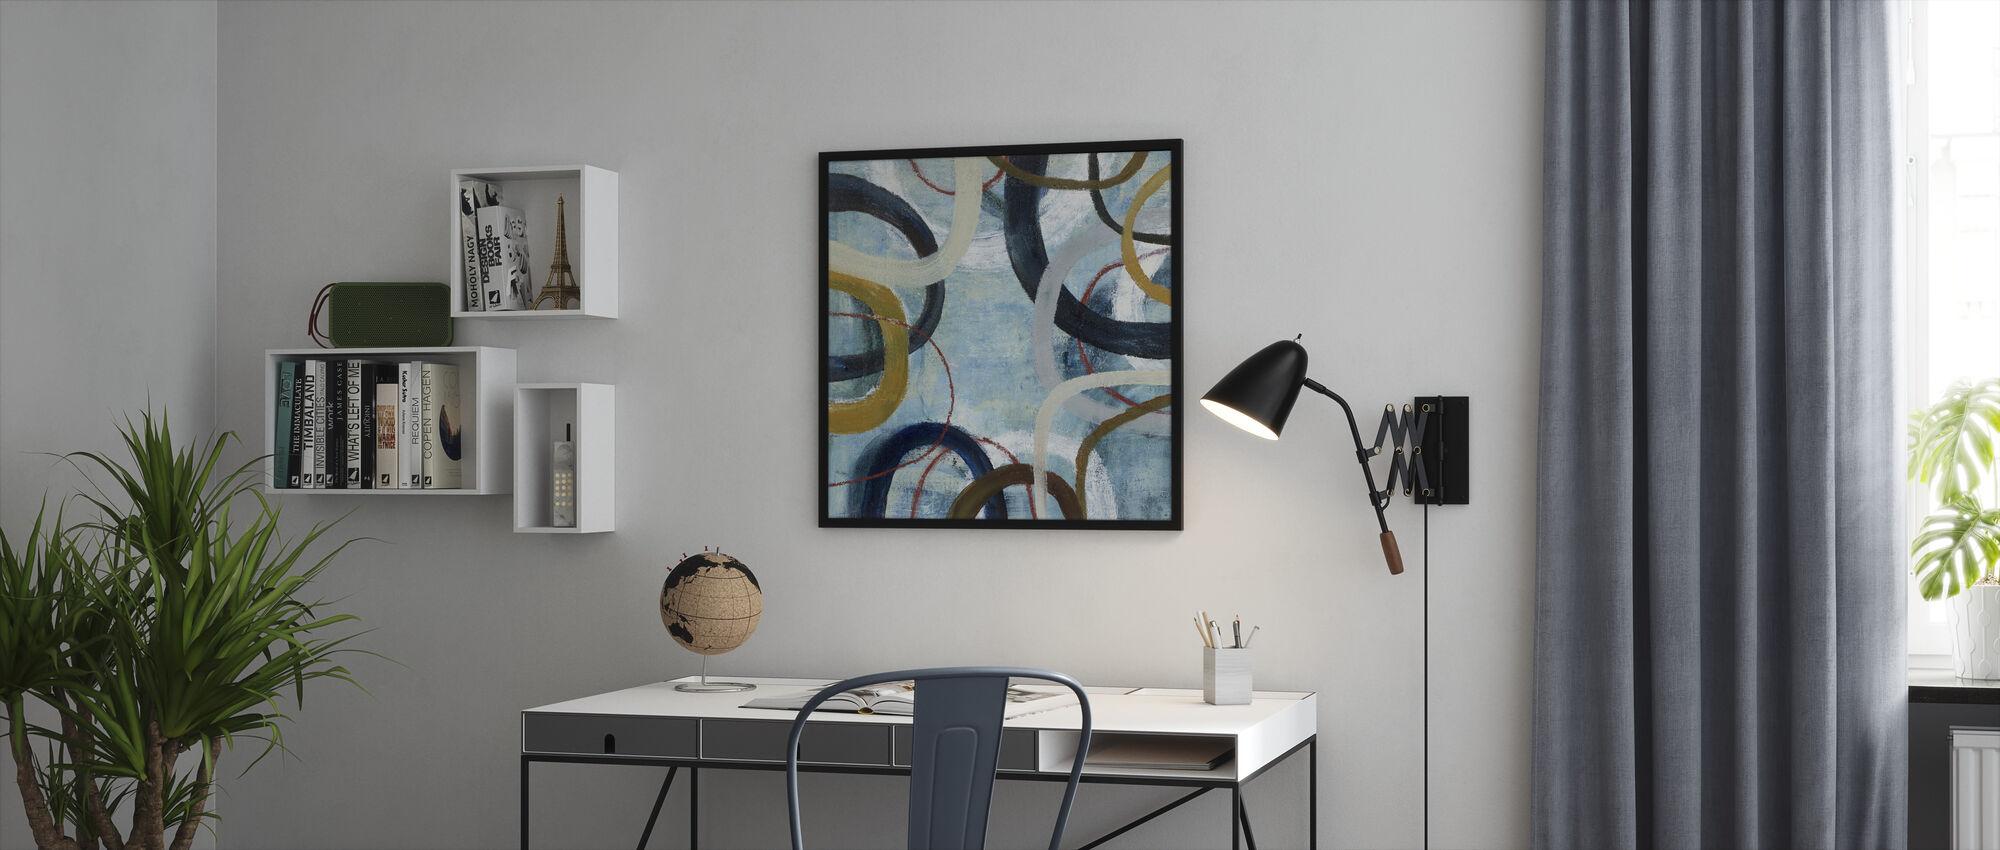 Dwell - Framed print - Office